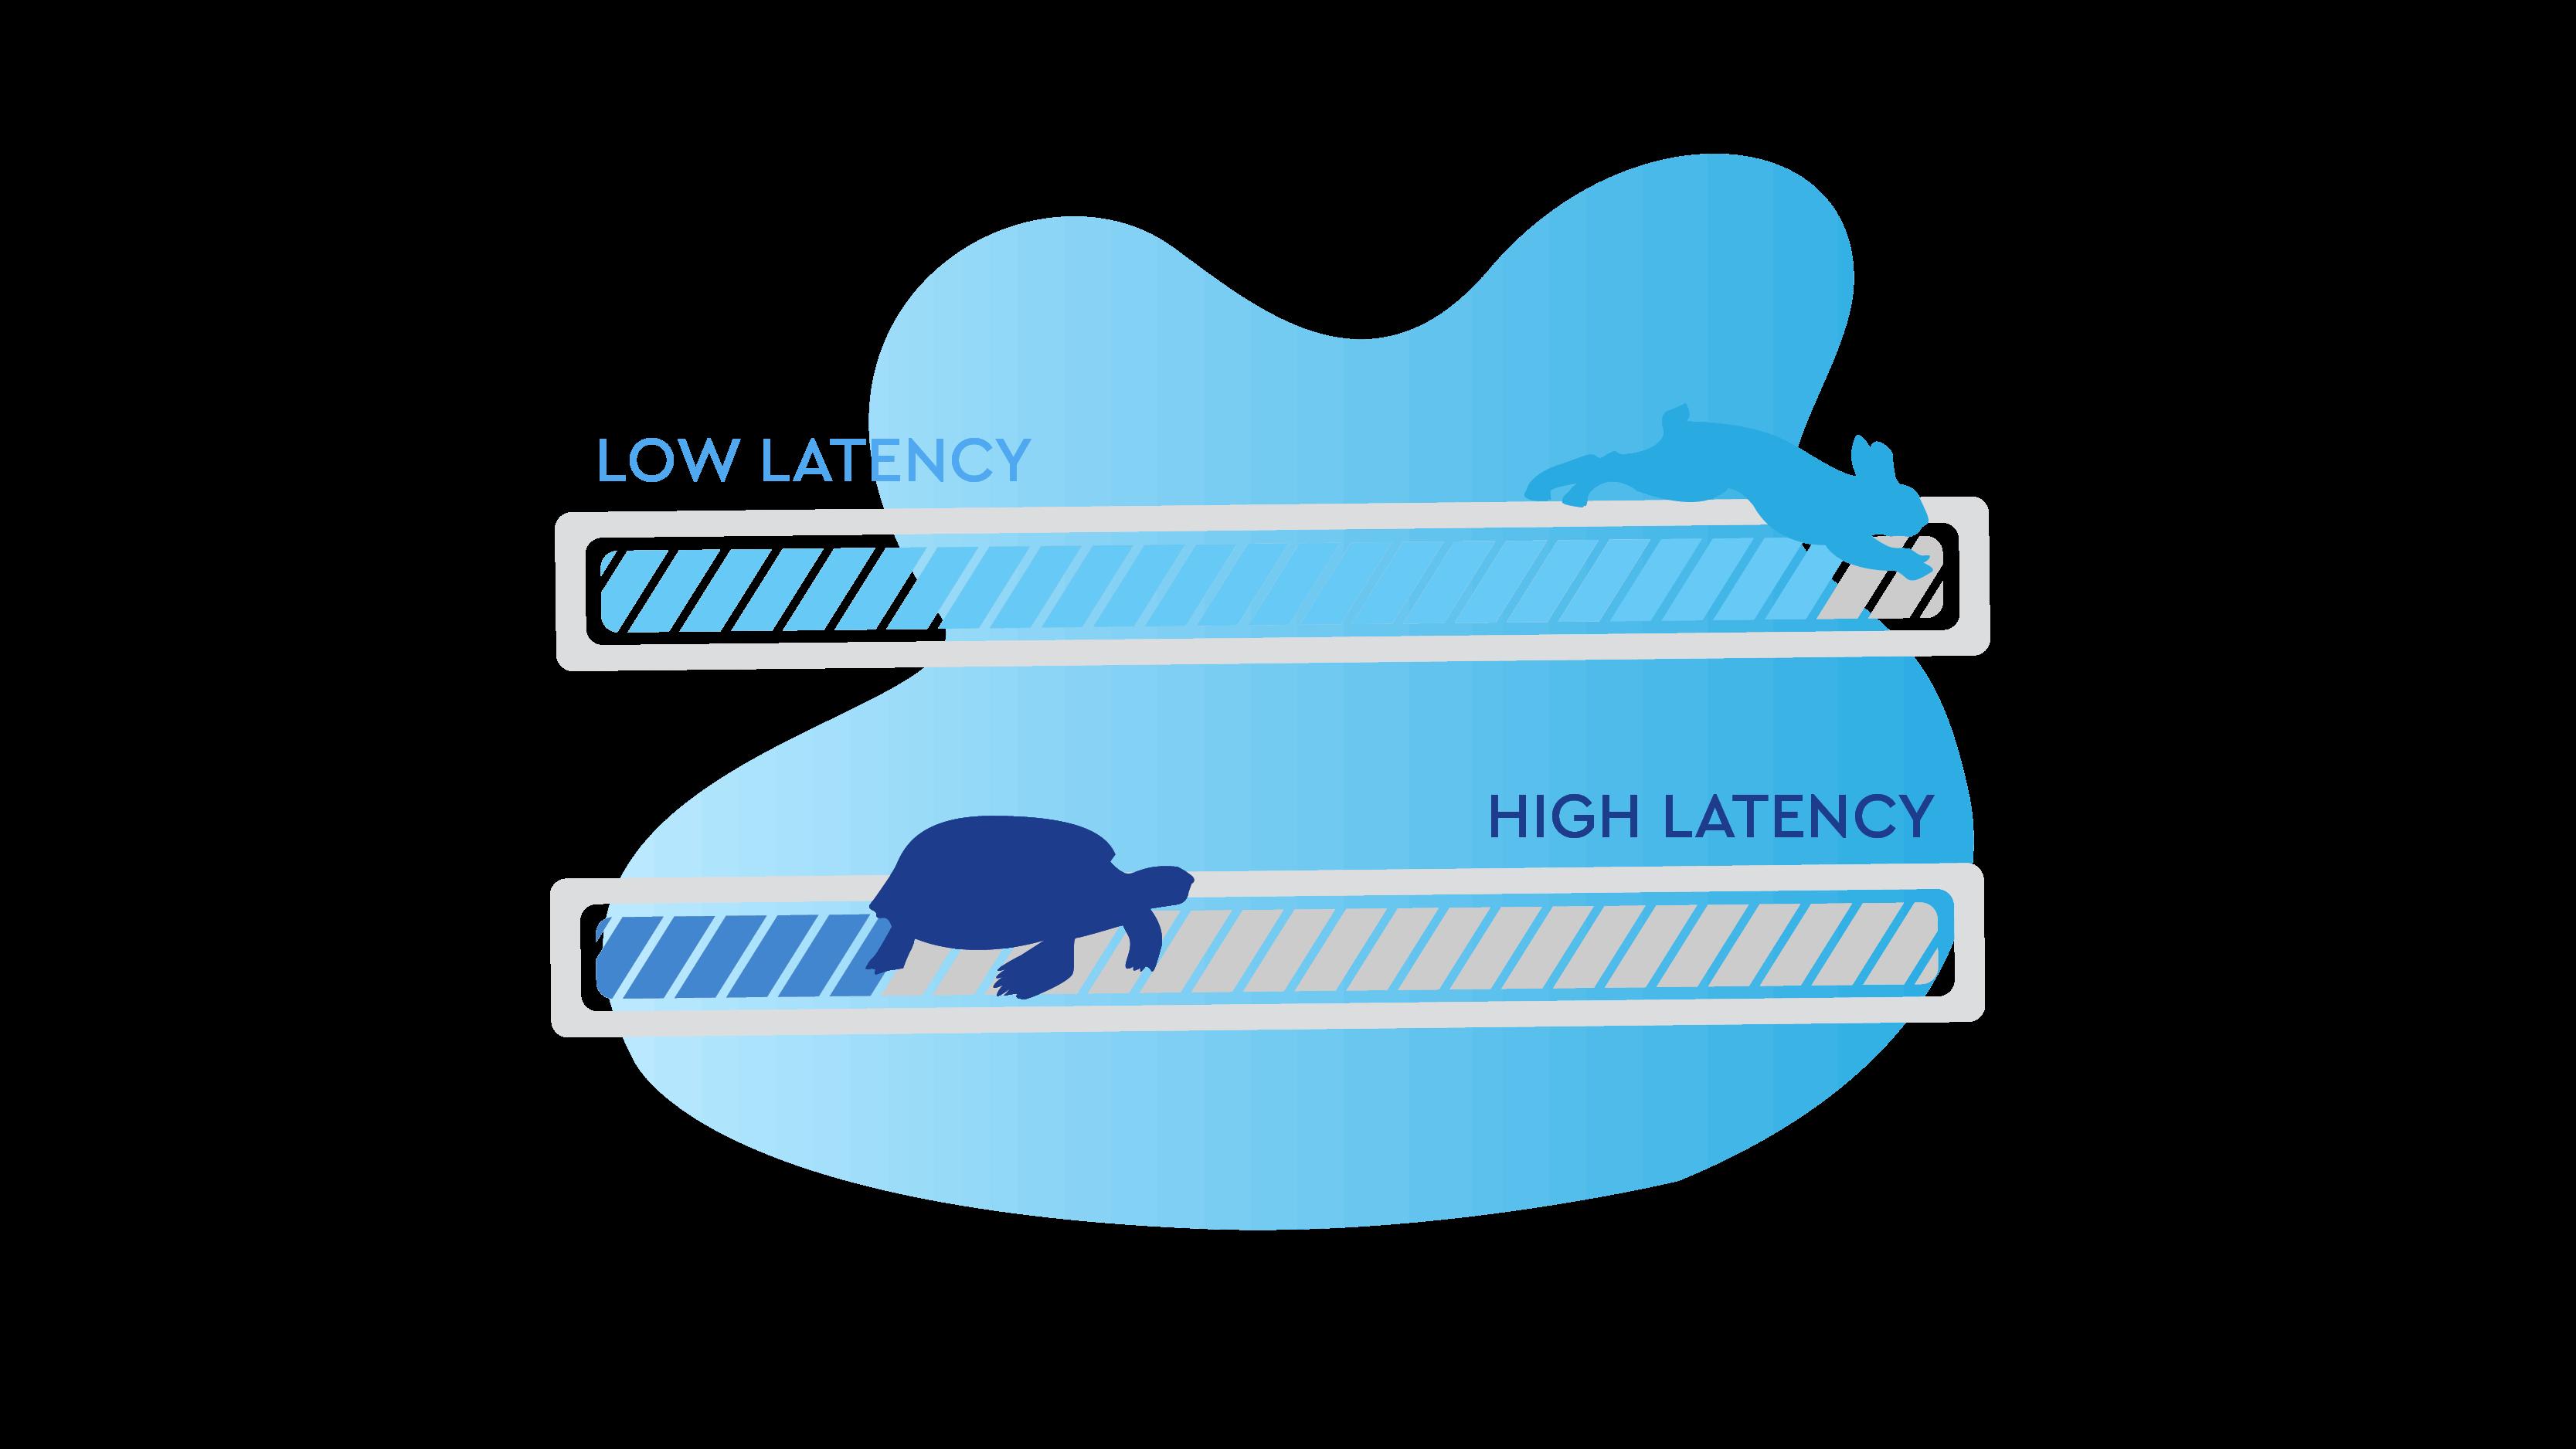 Speed meter for testing gaming latency